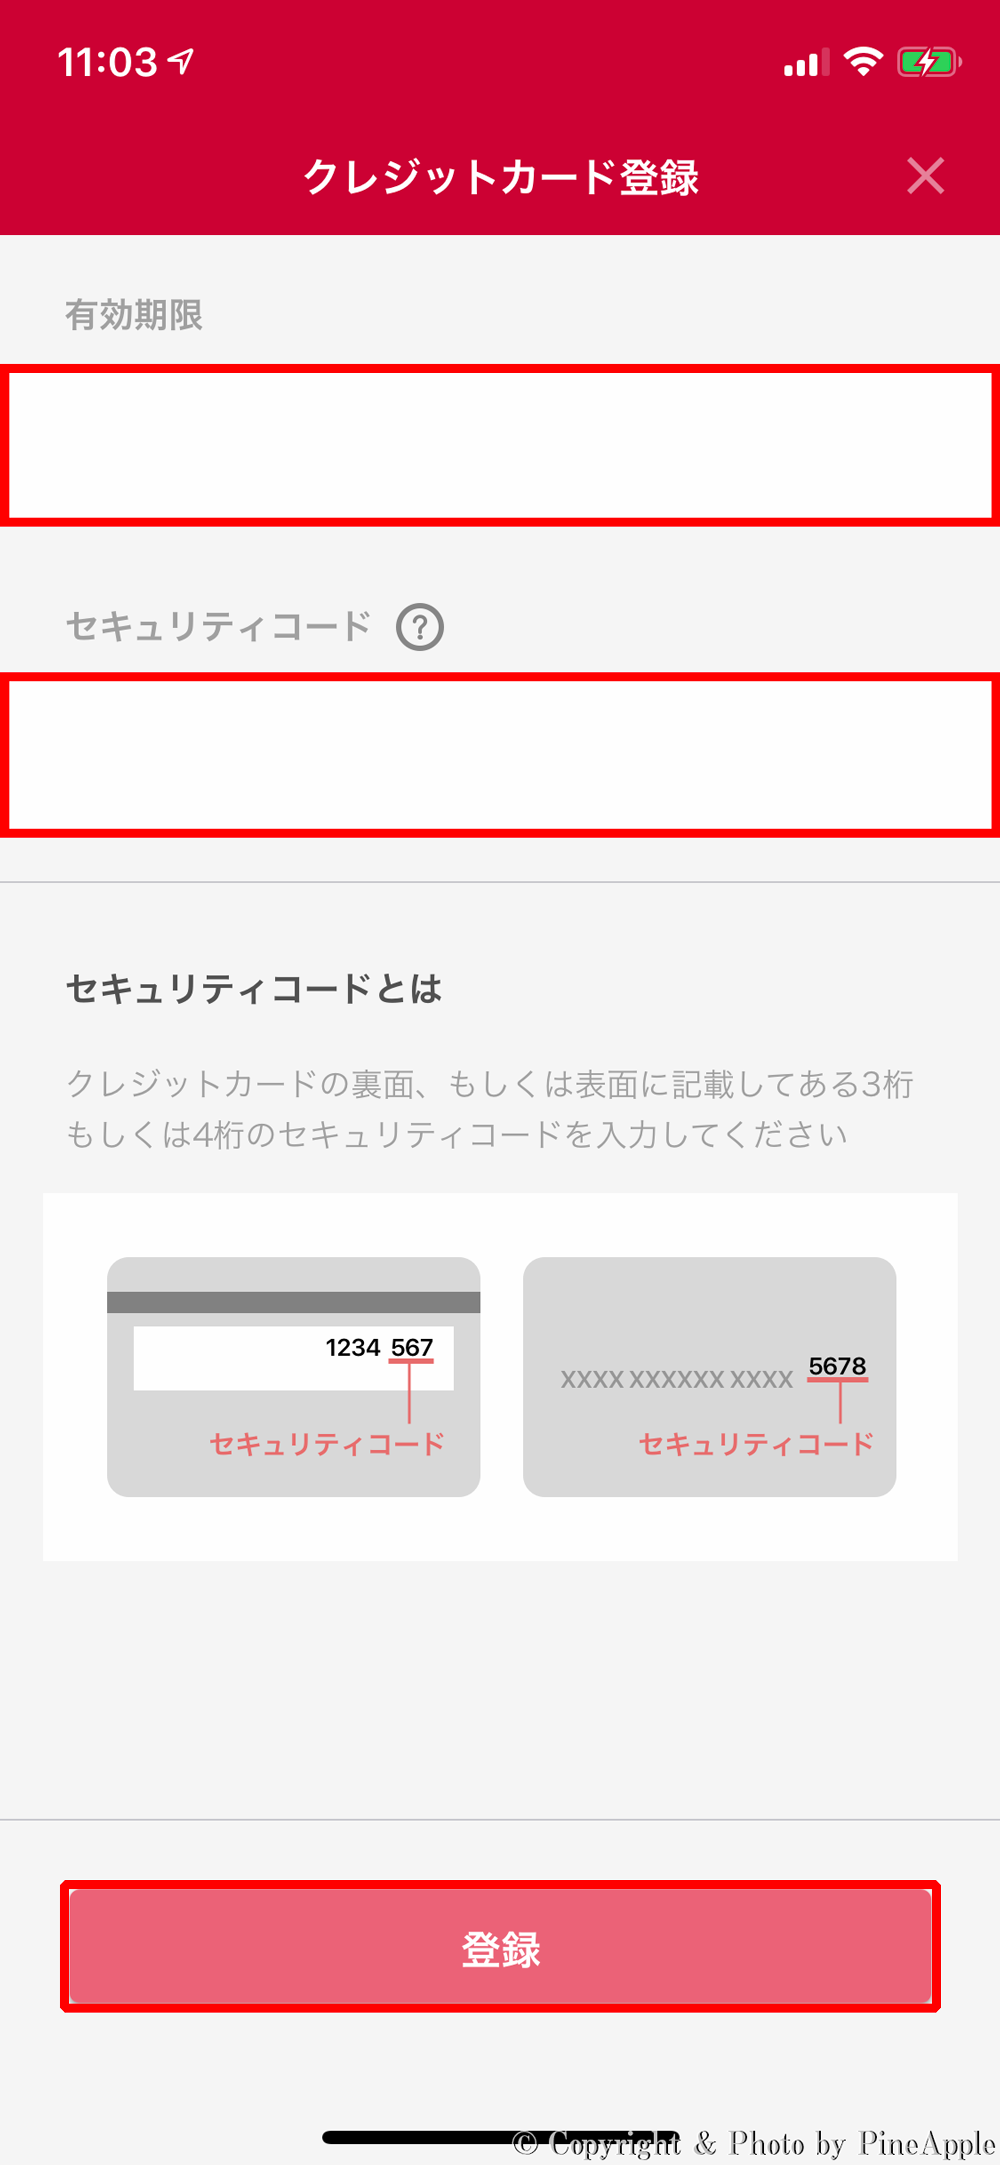 d 払い:「有効期限(月/年)」、「セキュリティーコード」を入力」し、「登録」をタップ